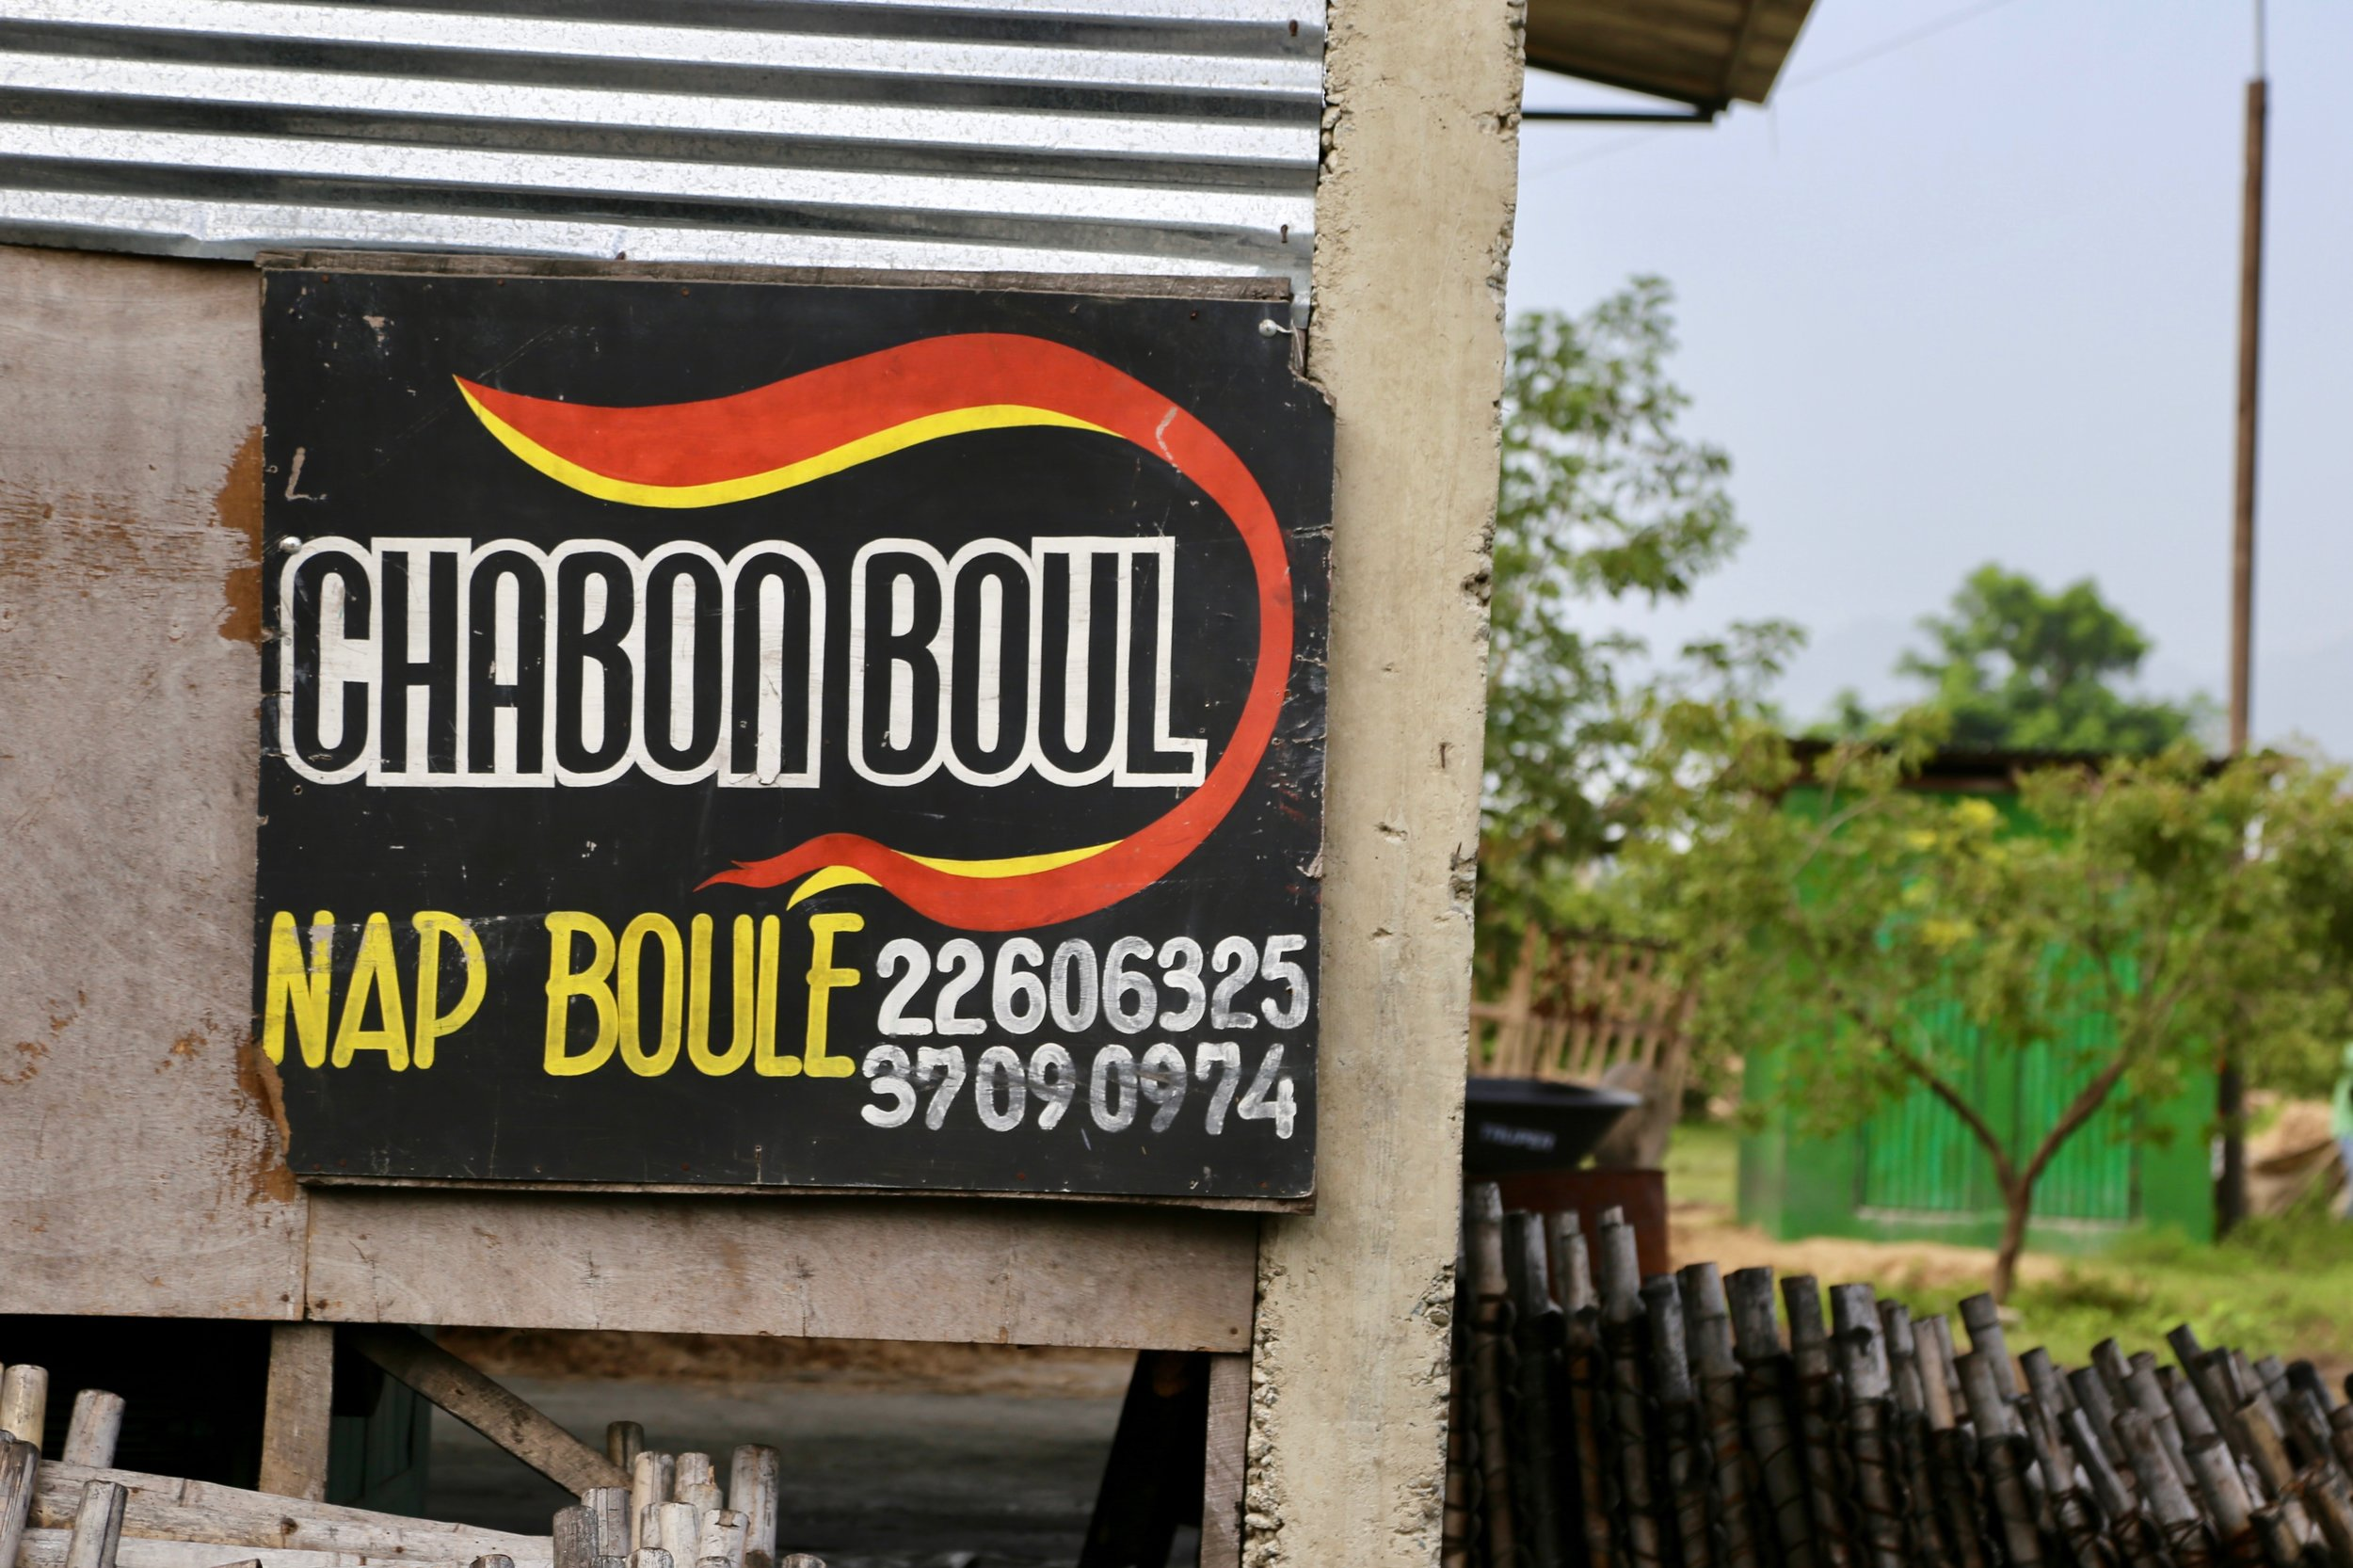 Chabon Boul: Haitian branded green charcoal